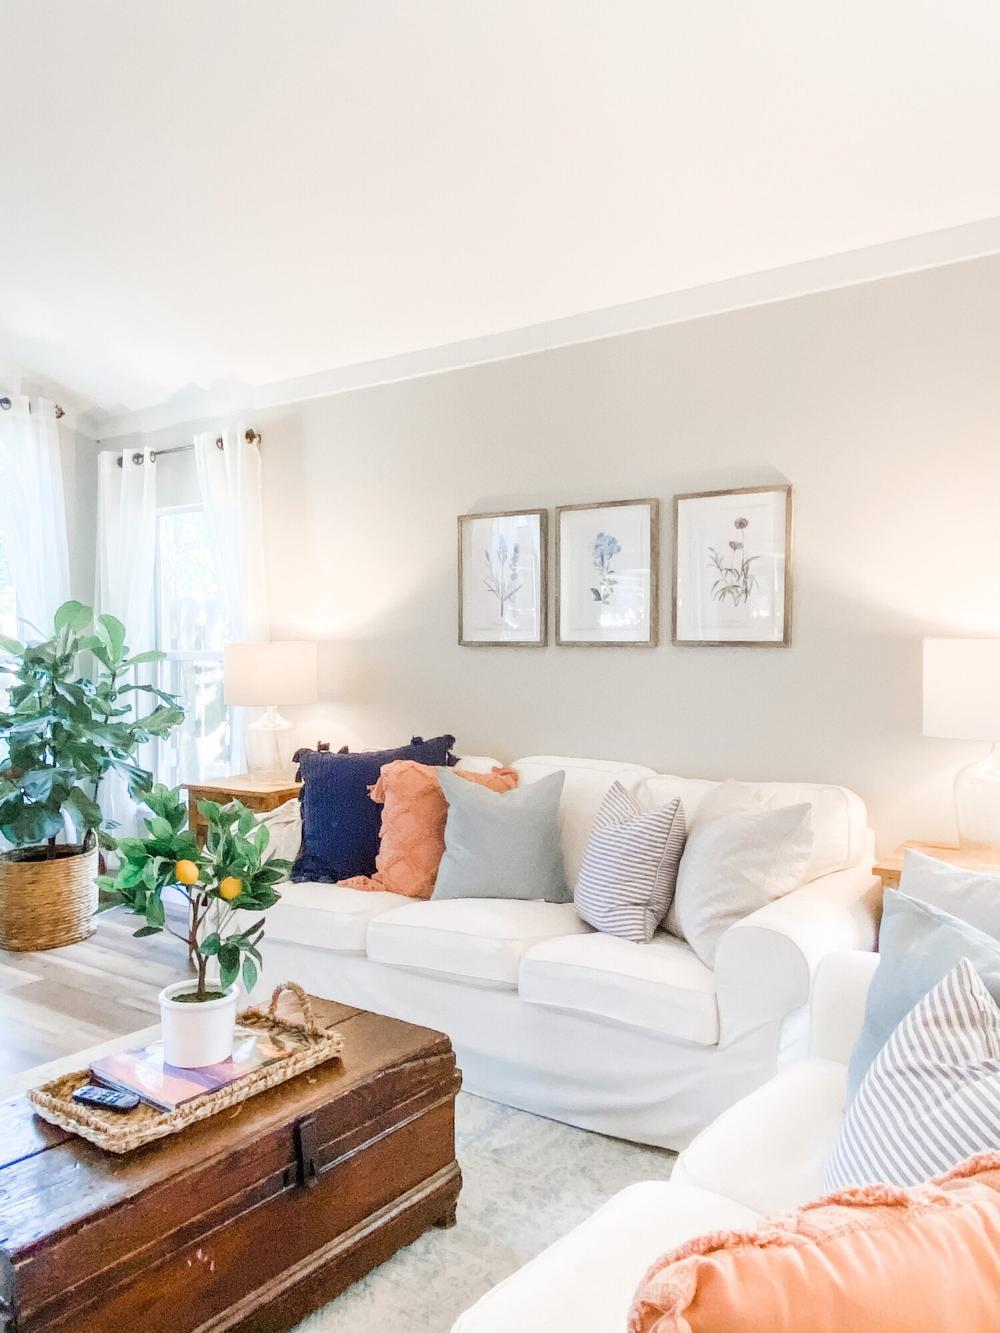 Mix Match Sofa Pillows Living Simply By Design Living Room Pillows Room Sofa Pillows